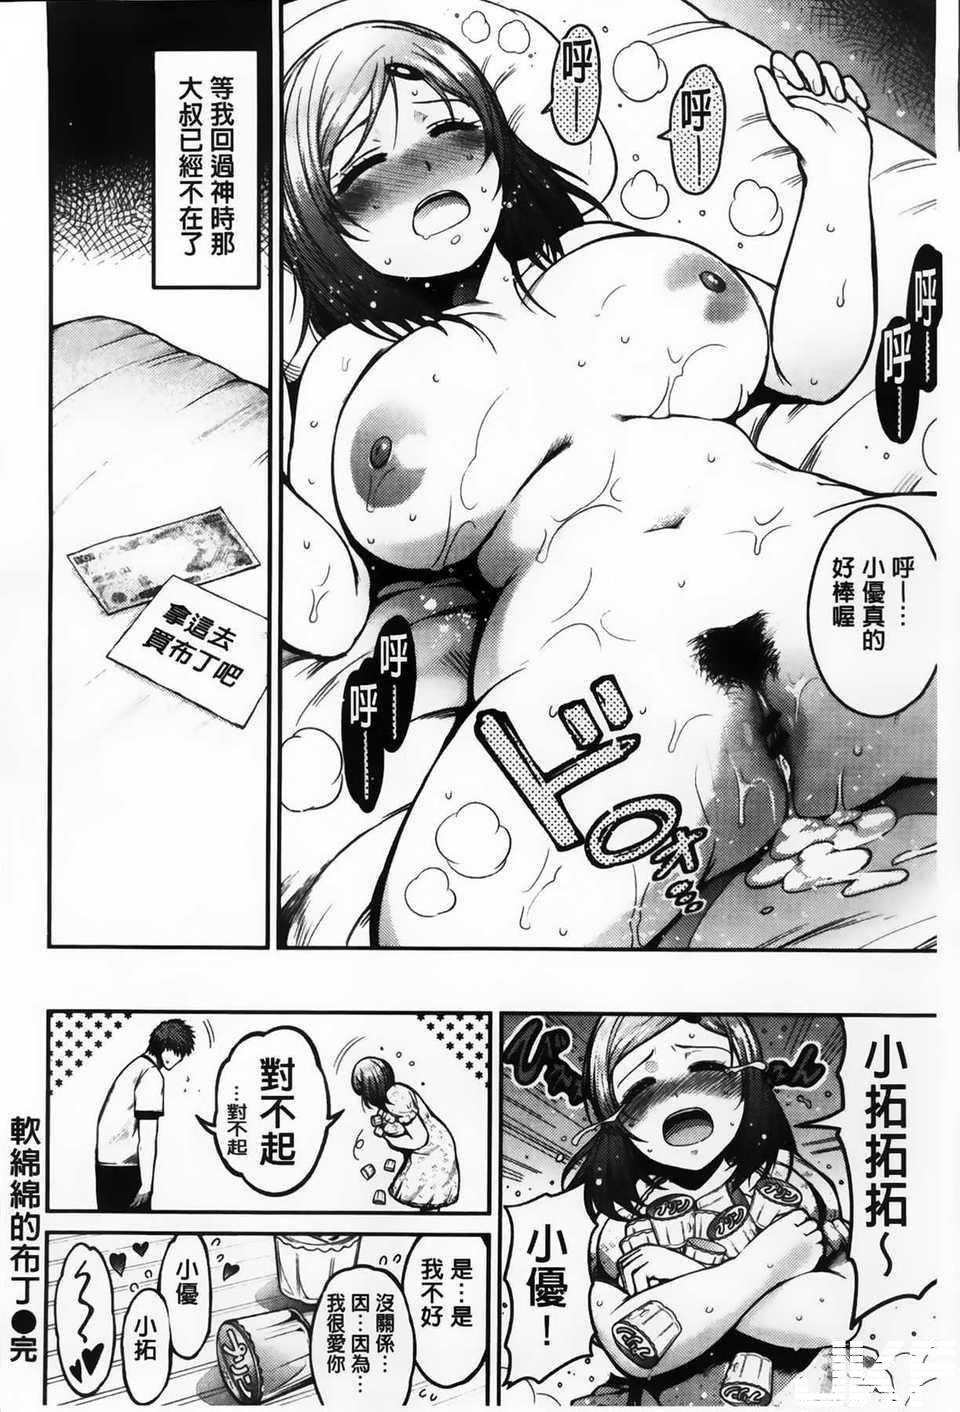 AoJiaoZero_208.jpg